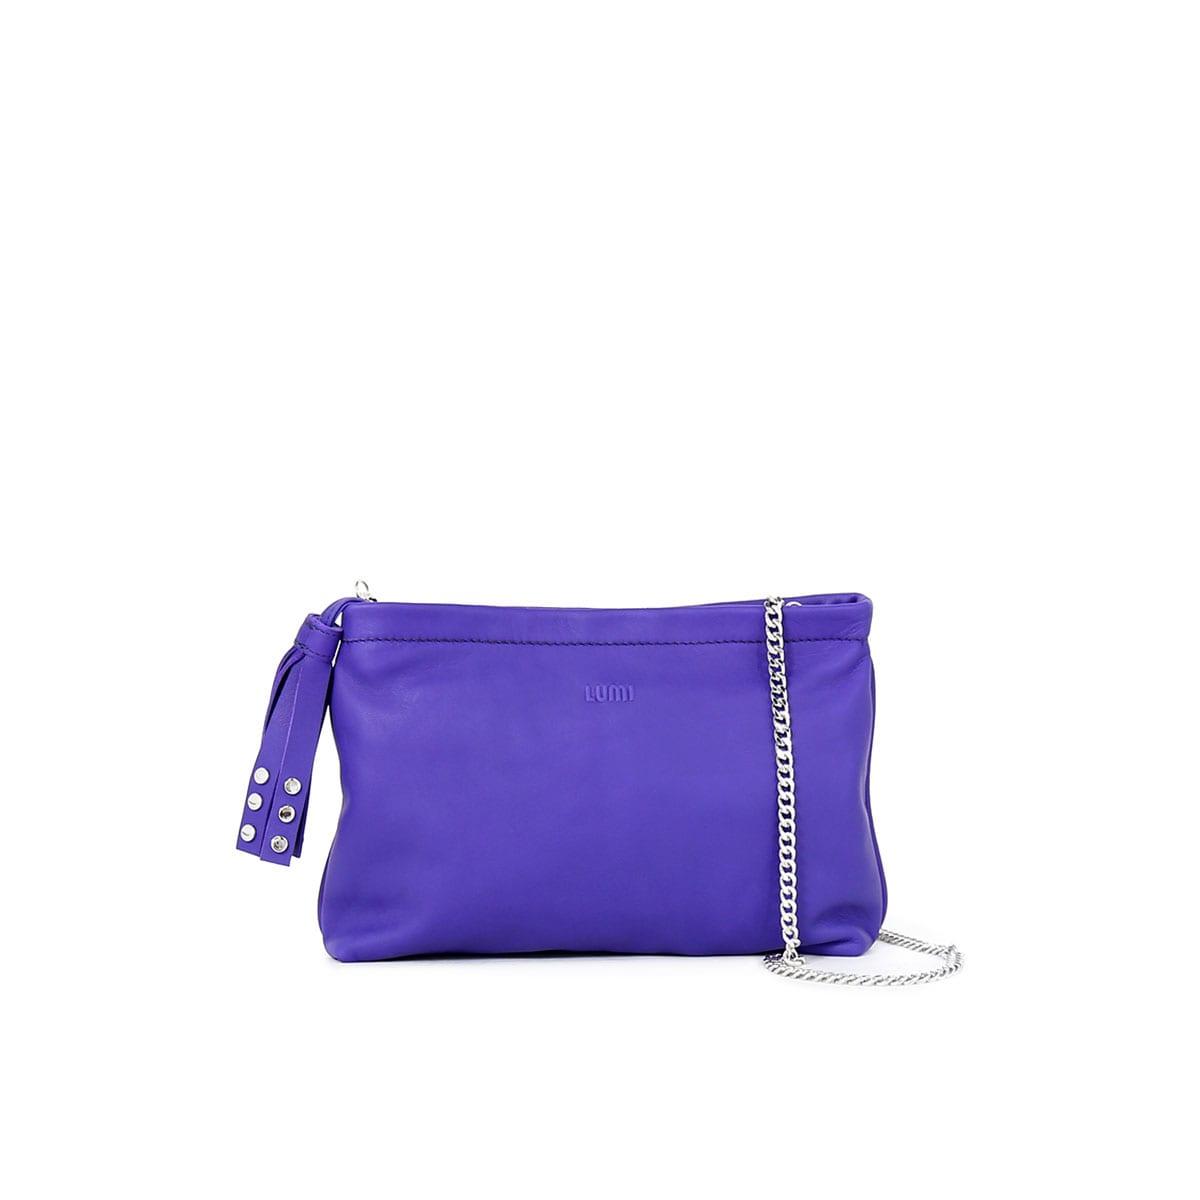 0d459e3281d Home Limited Edition Party Tamara T-Bag Violet